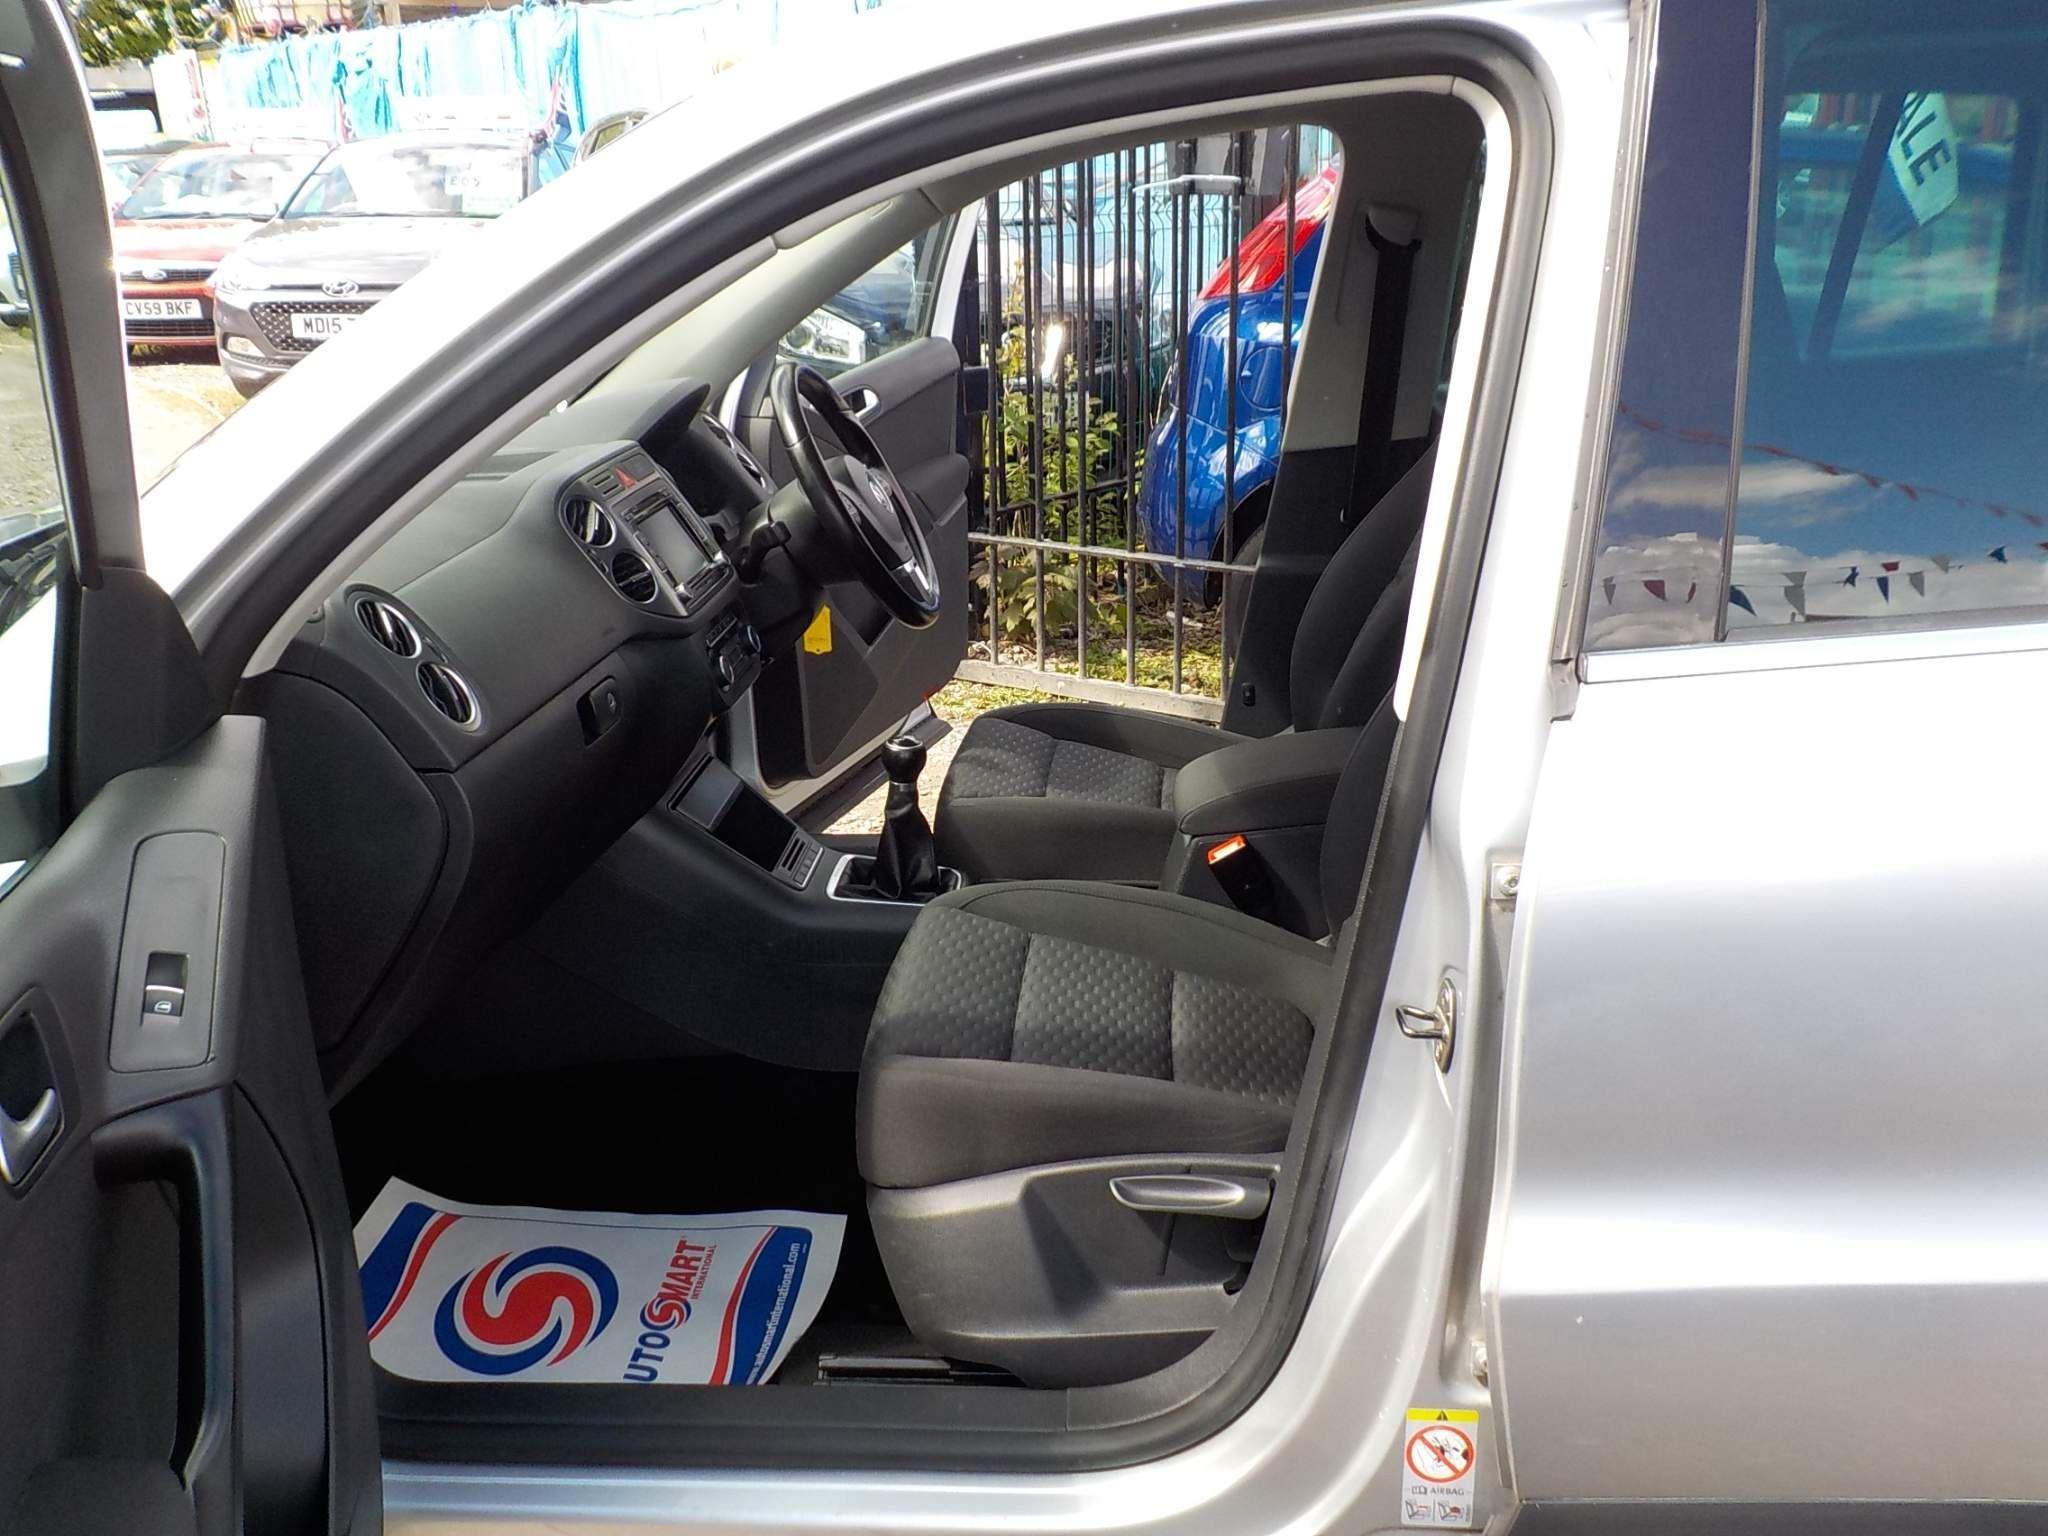 Volkswagen Tiguan 2.0 TDI Match 4MOTION 5dr